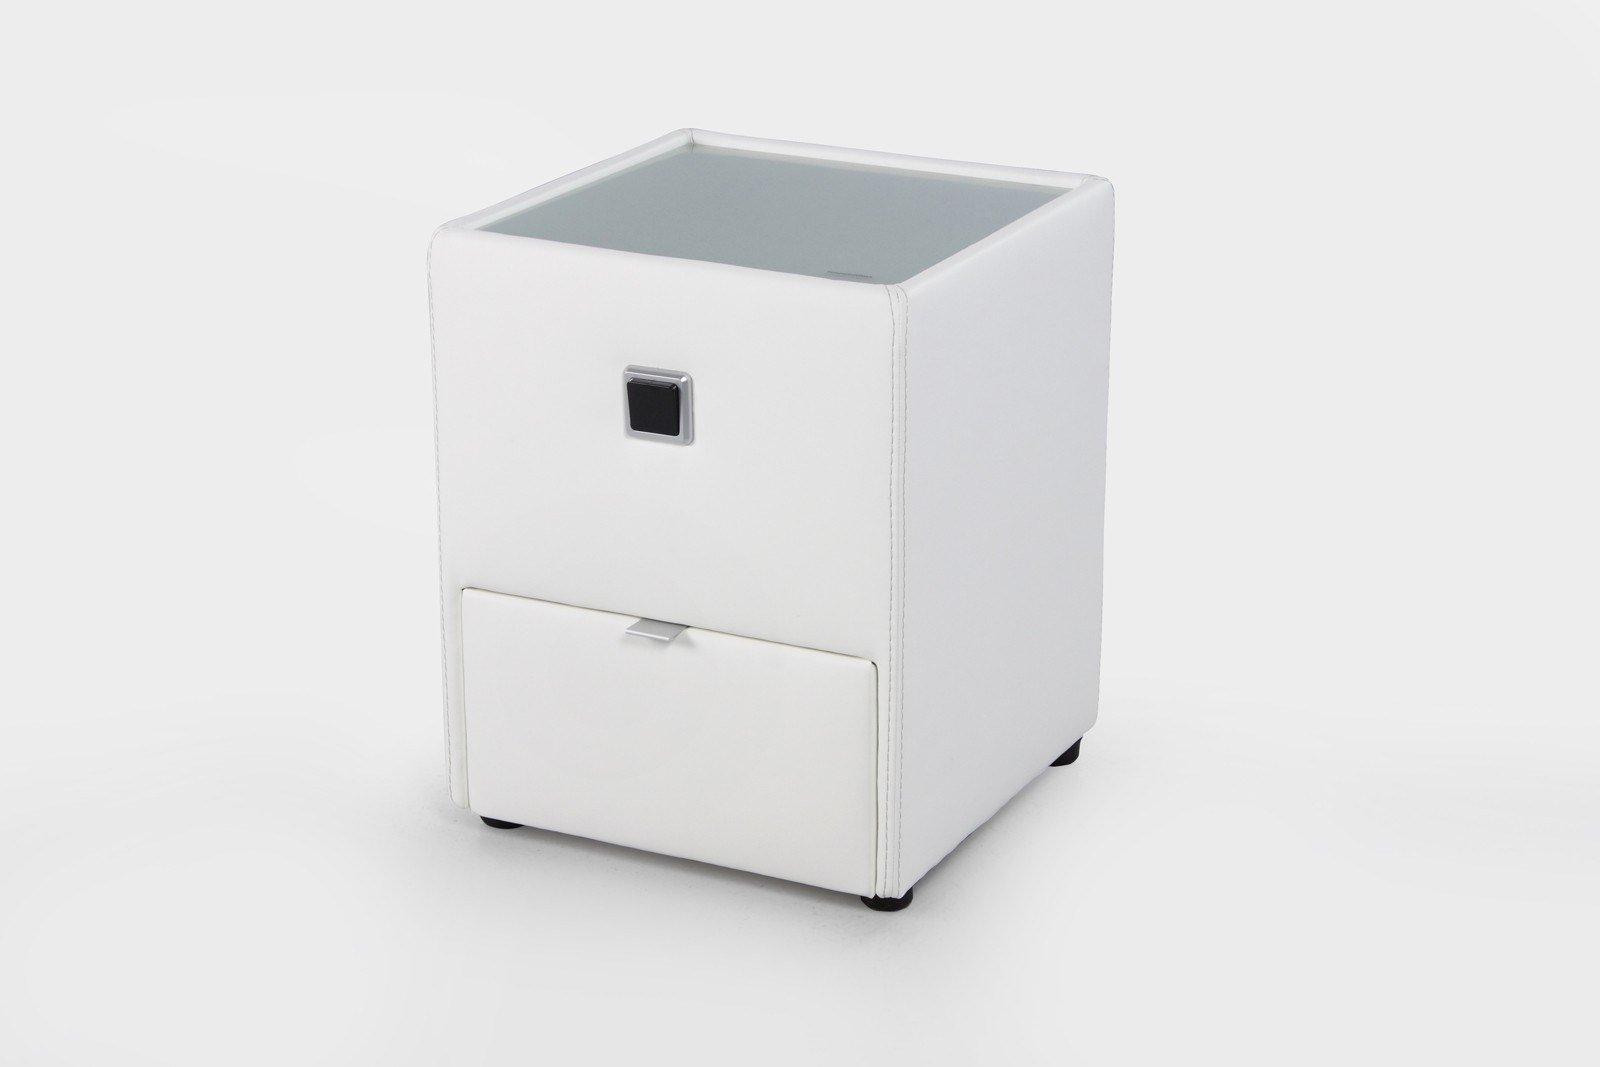 jockenh fer lancy nachtkonsole in wei mit schublade. Black Bedroom Furniture Sets. Home Design Ideas